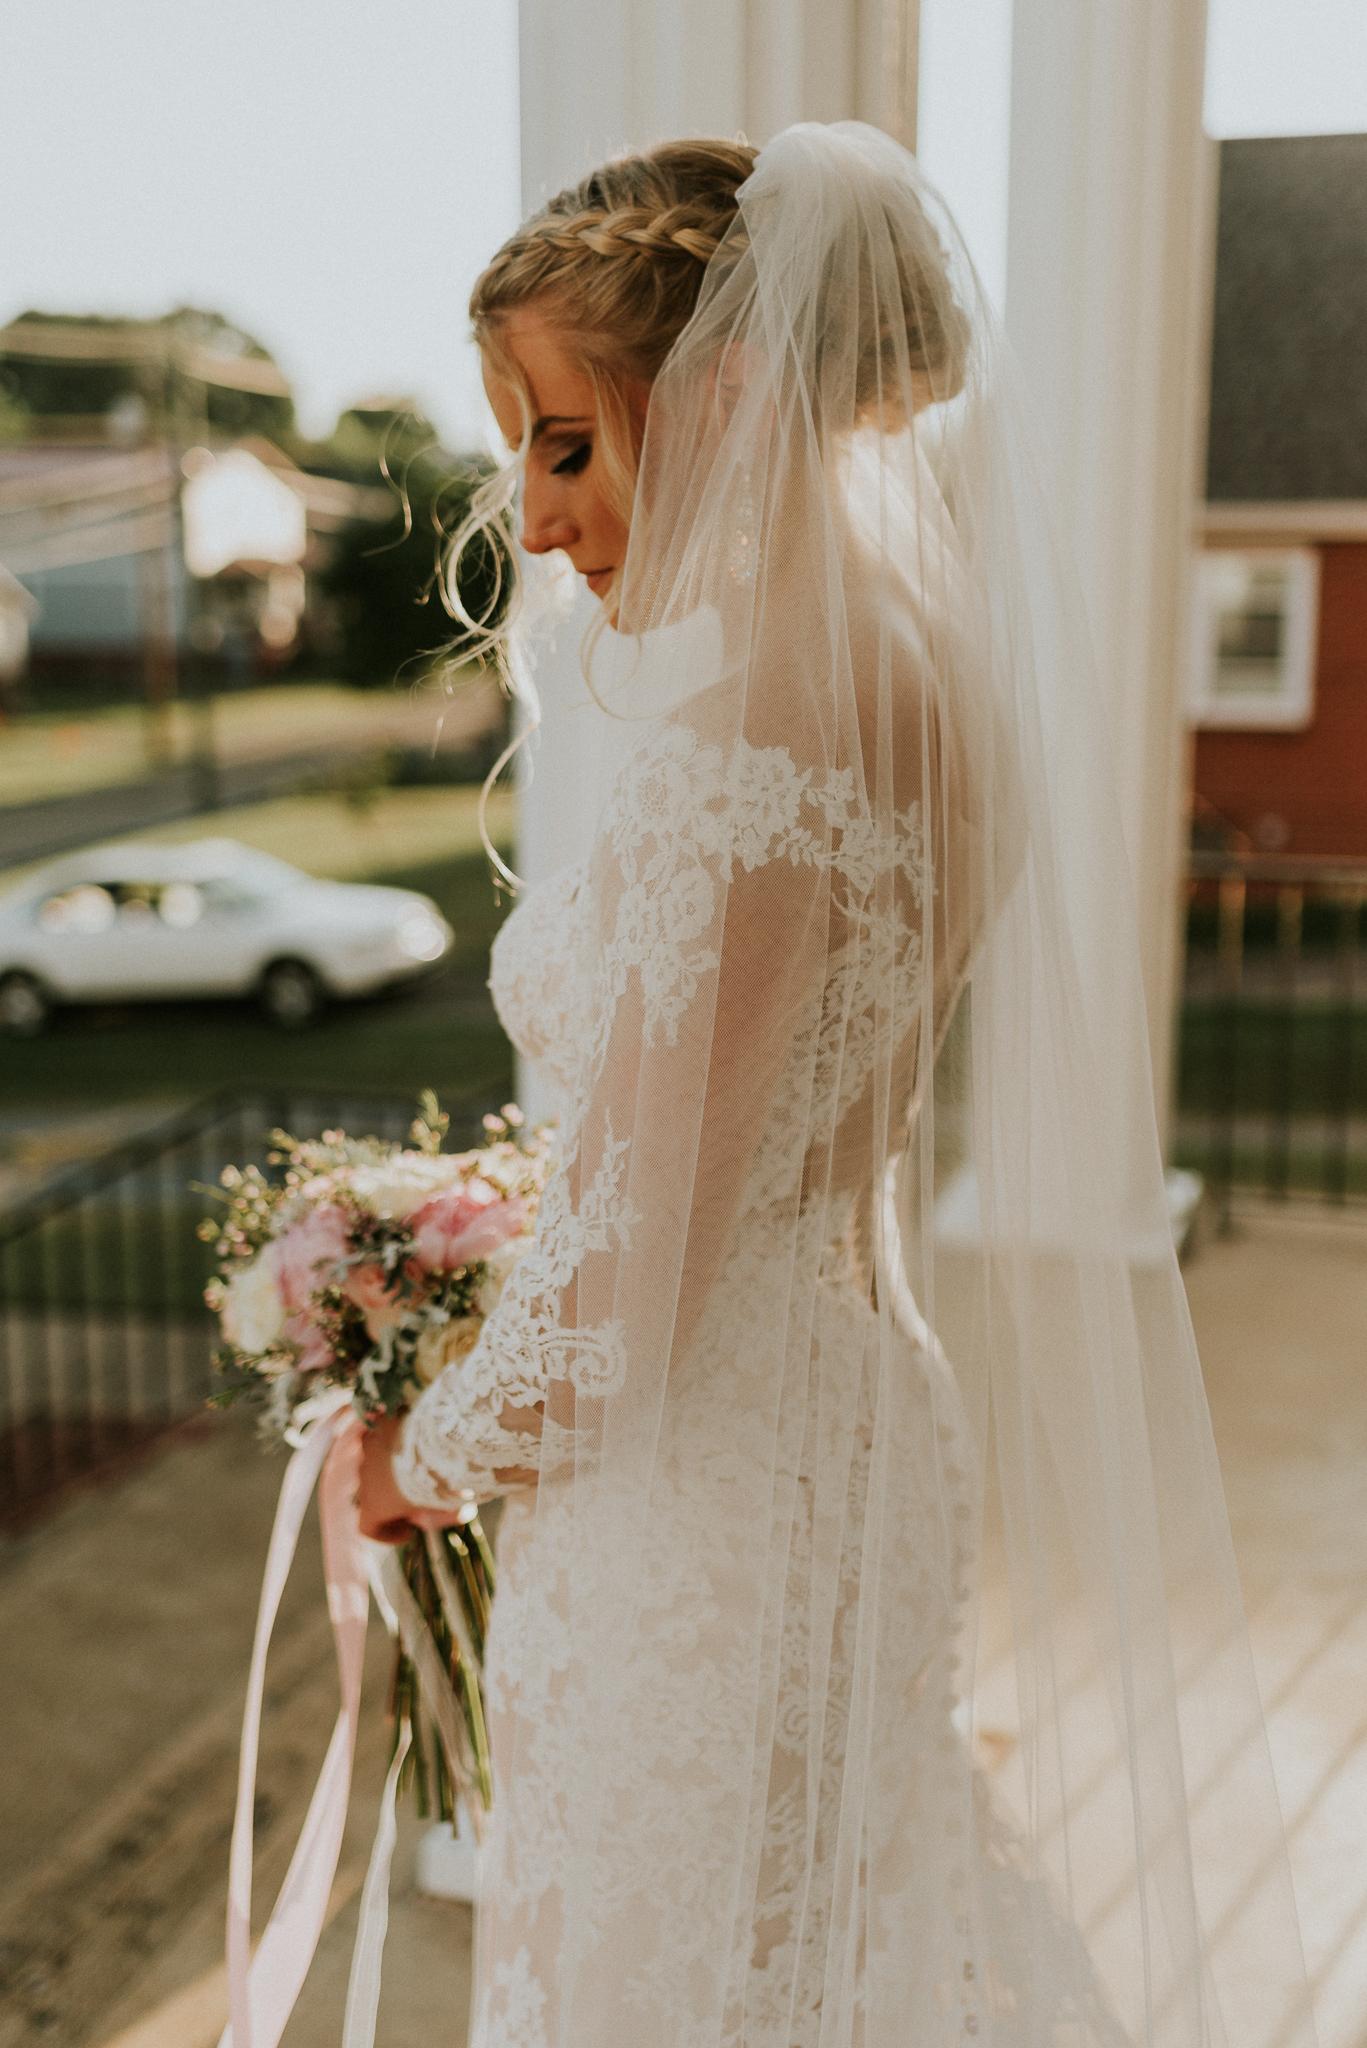 east-tn-wedding-photographer-tennessee-elopement-photographer-kingsport-tn-wedding-photographer (34 of 50).jpg